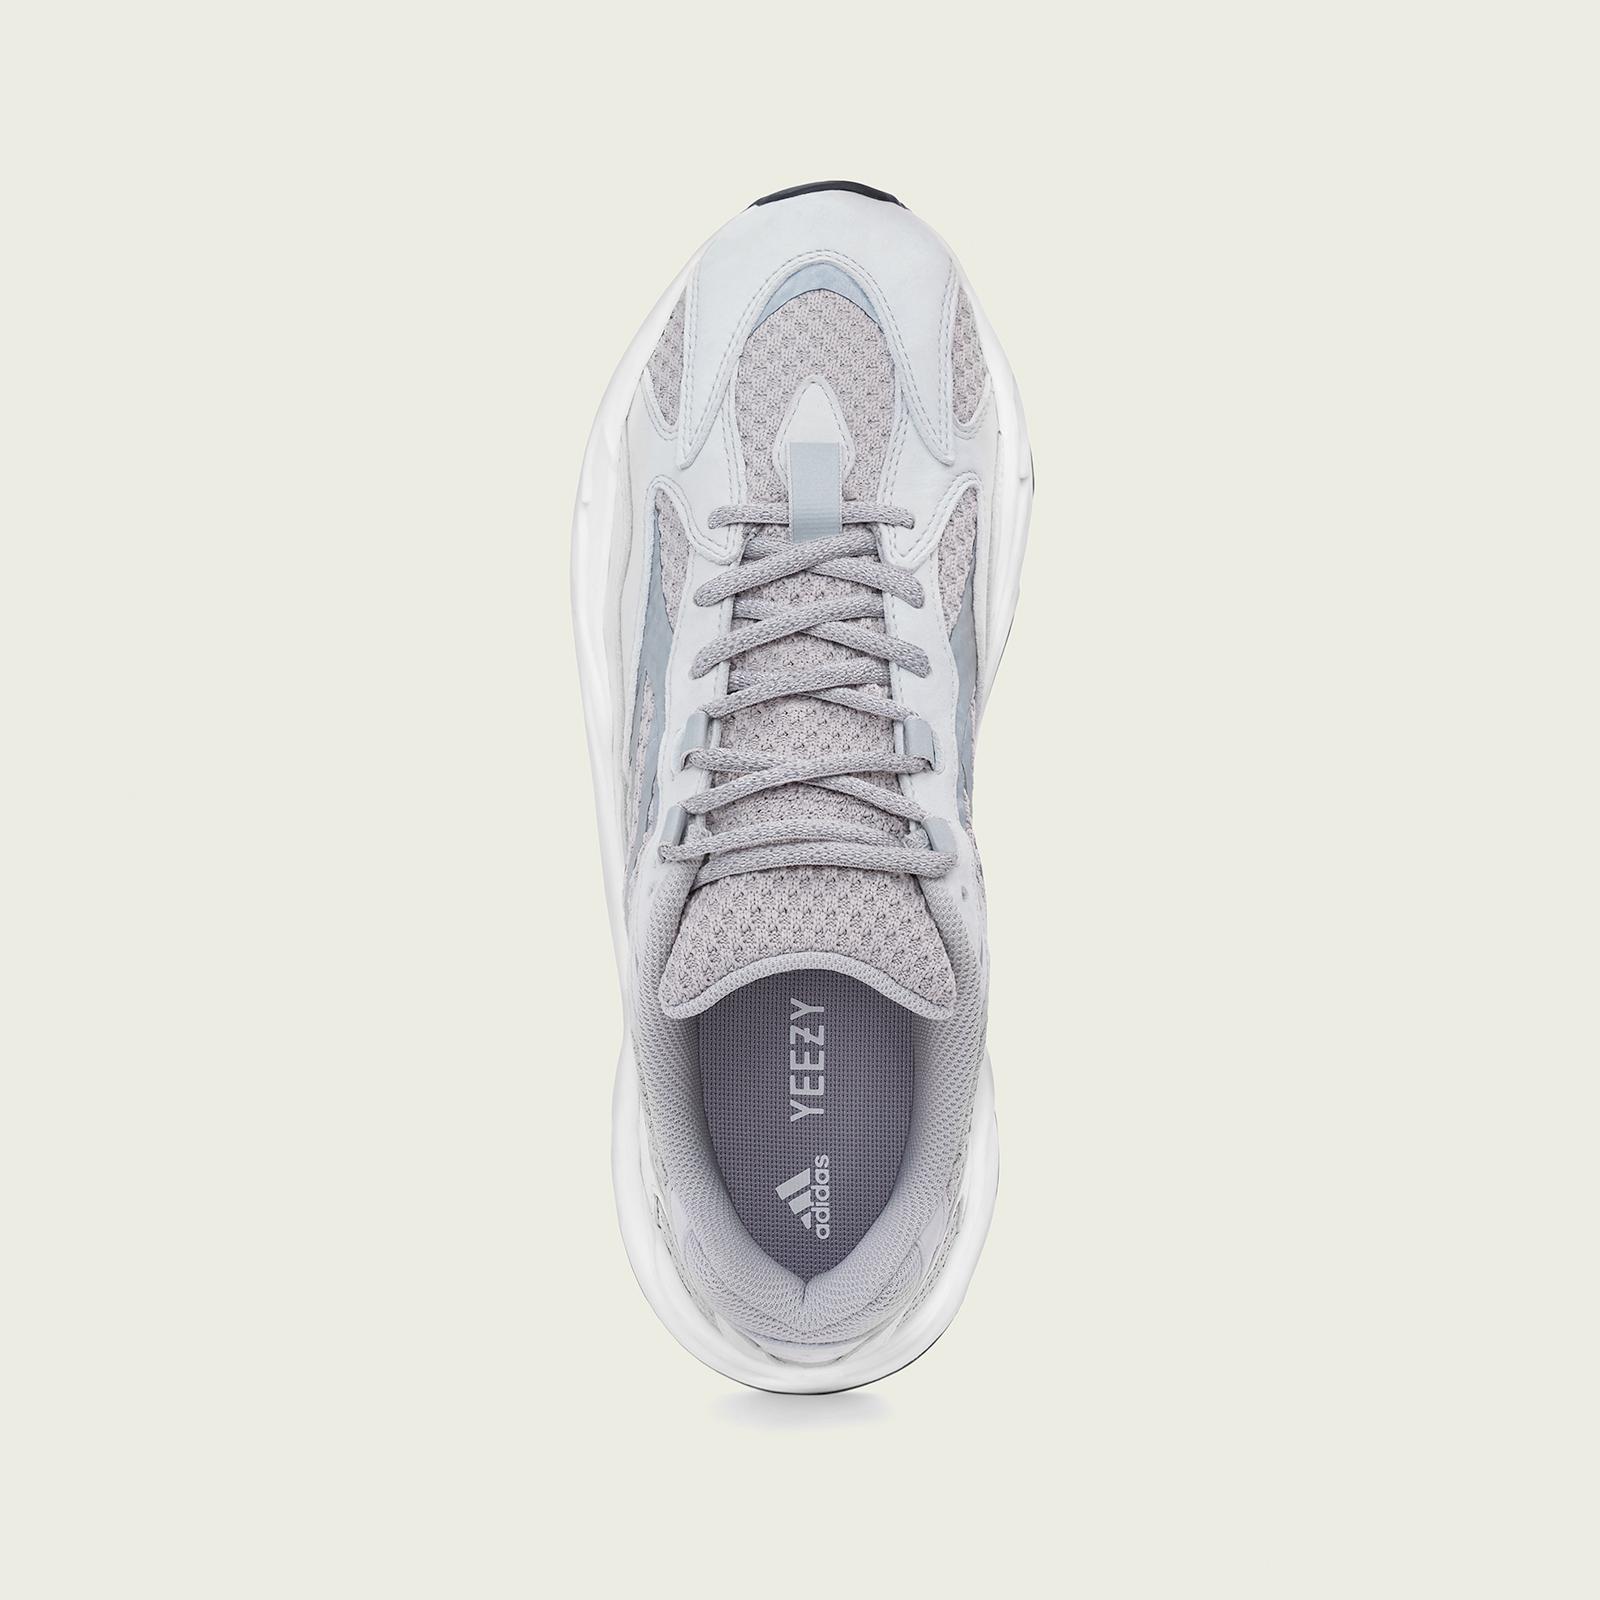 best website 34e85 09d07 adidas Originals x Kanye West Yeezy Boost 700 V2 ... Your Adidas Yeezy  Boost 700